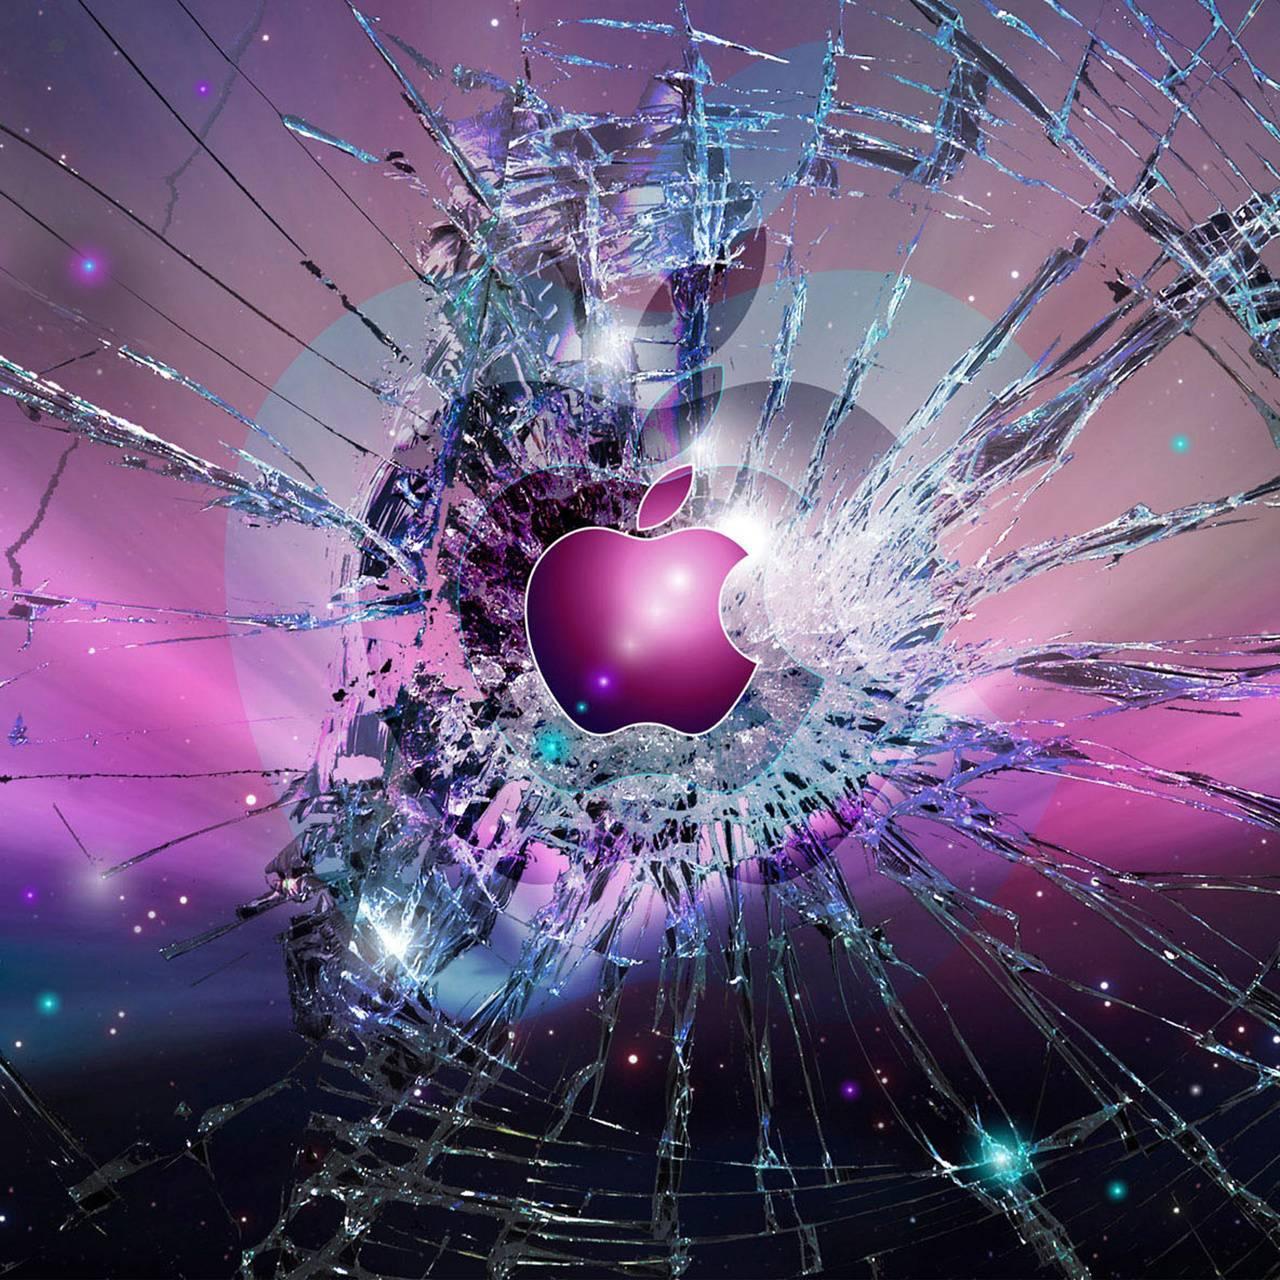 Broken Screen Wallpaper: Apple Broken Screen Wallpaper By Almost_Famous_